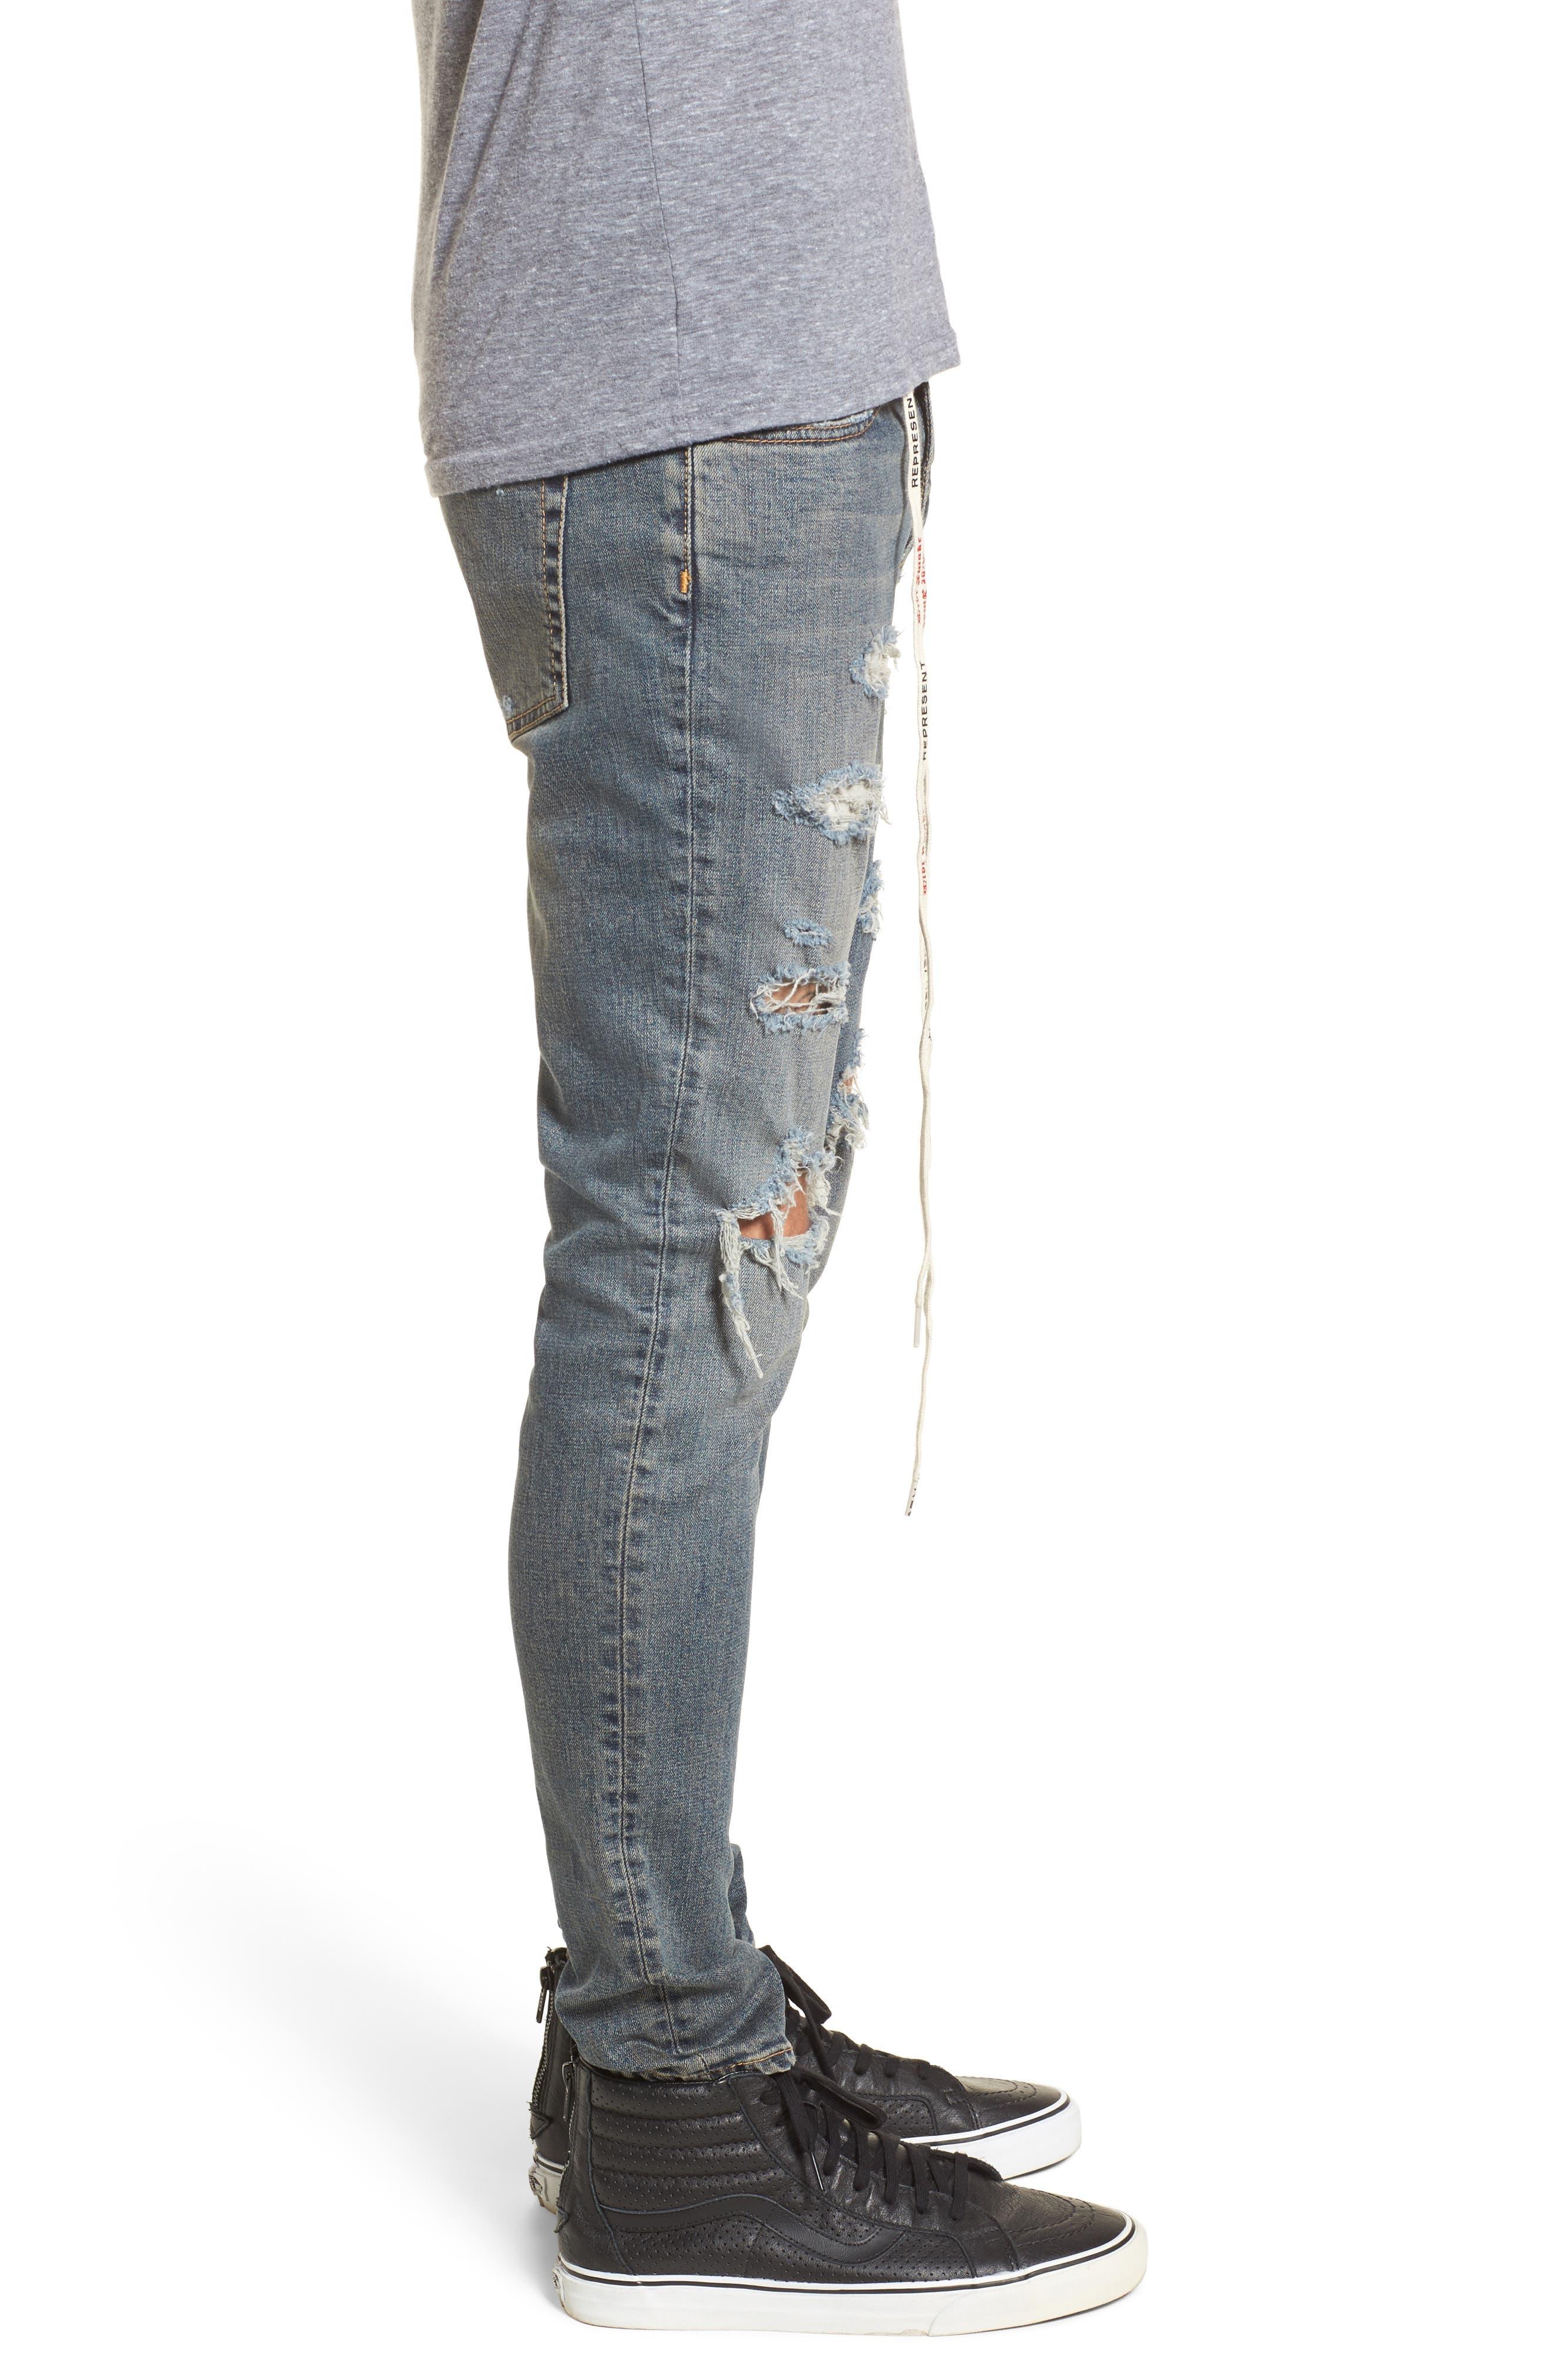 Repairer Slim Fit Denim Pants,                             Alternate thumbnail 3, color,                             ROCKSTAR BLUE